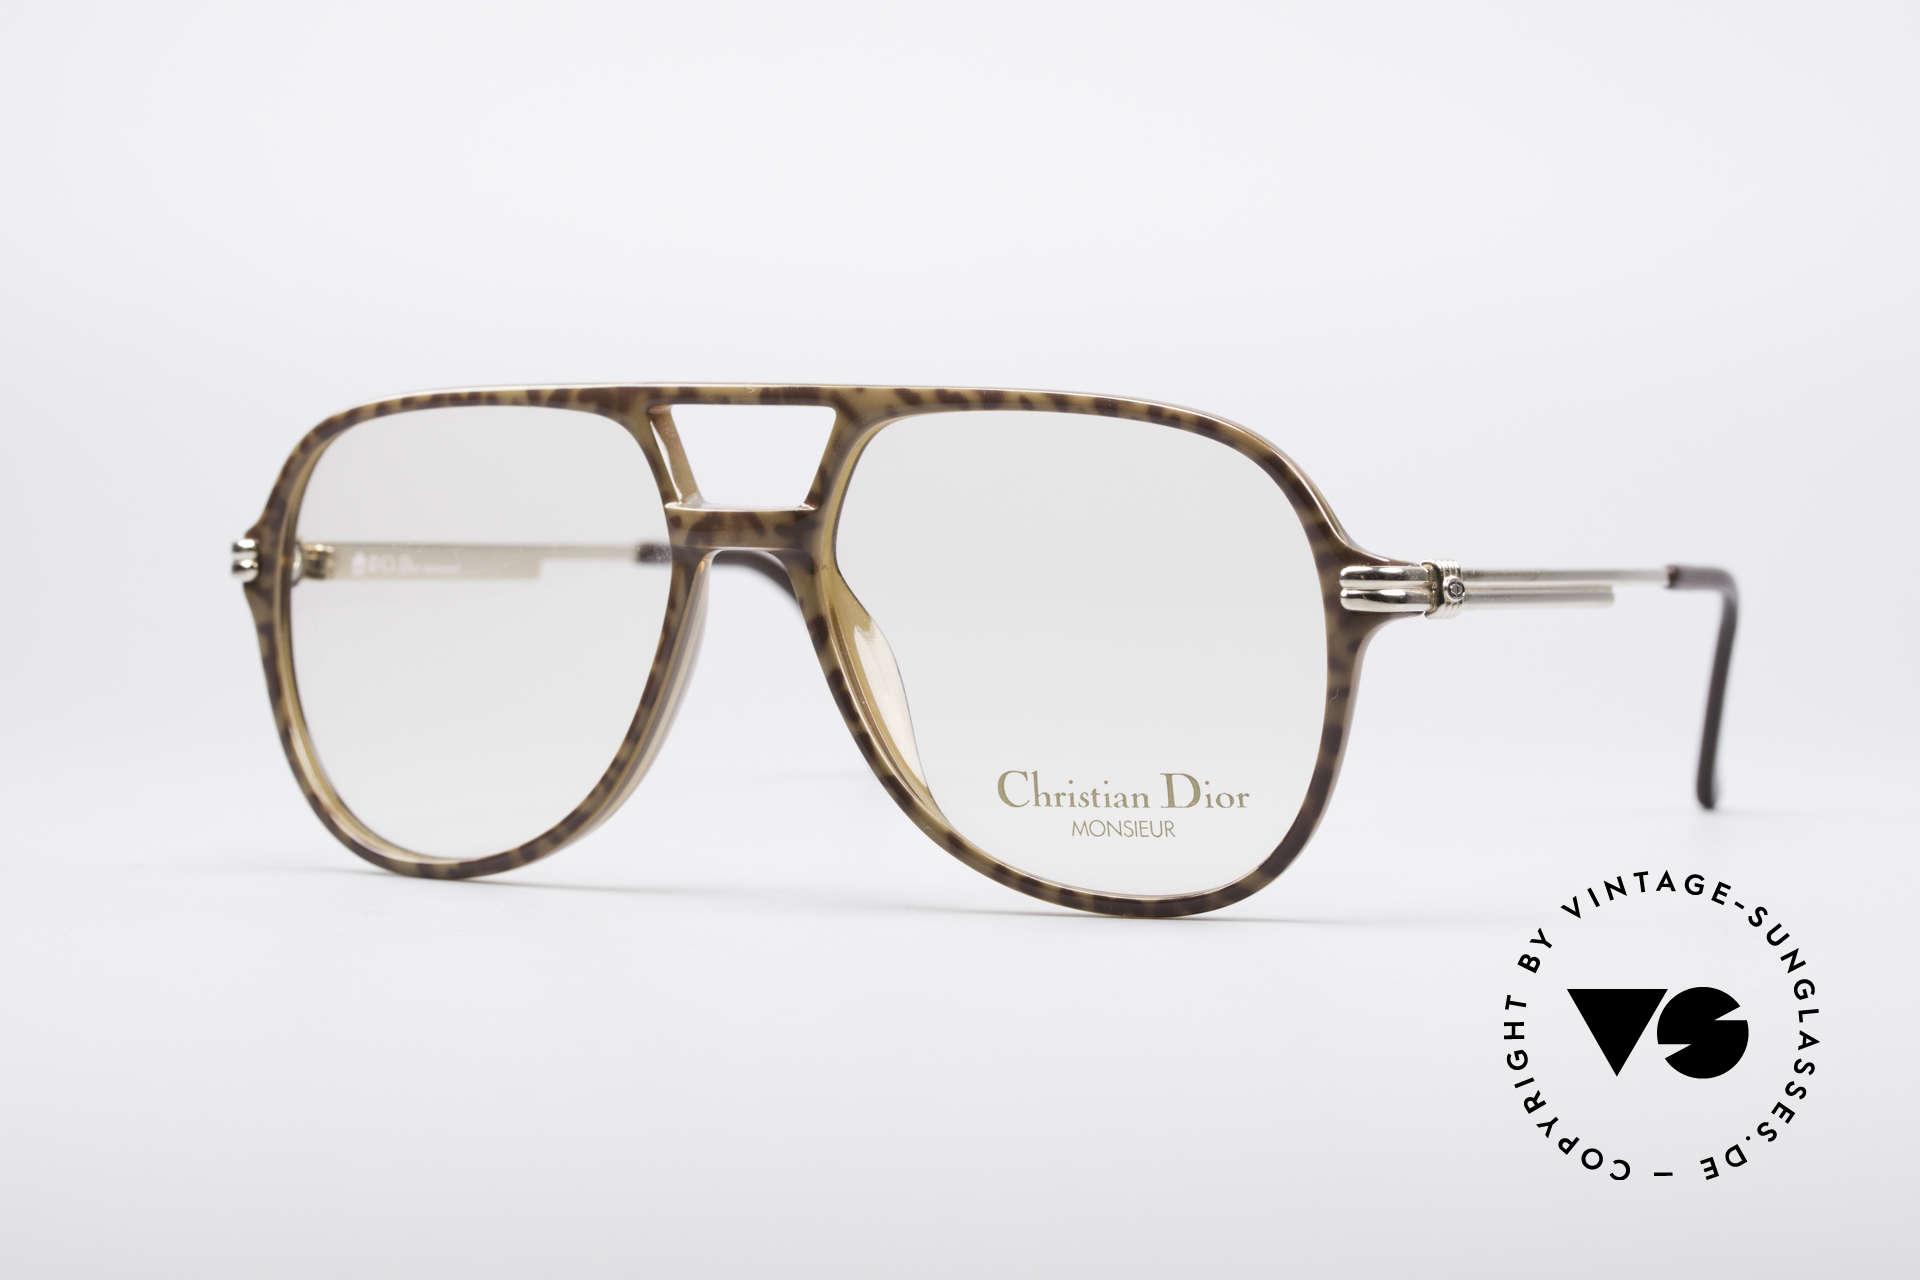 Christian Dior 2301 80's Optyl Frame Monsieur, vintage Christian Dior eyeglass-frame from 1985, Made for Men